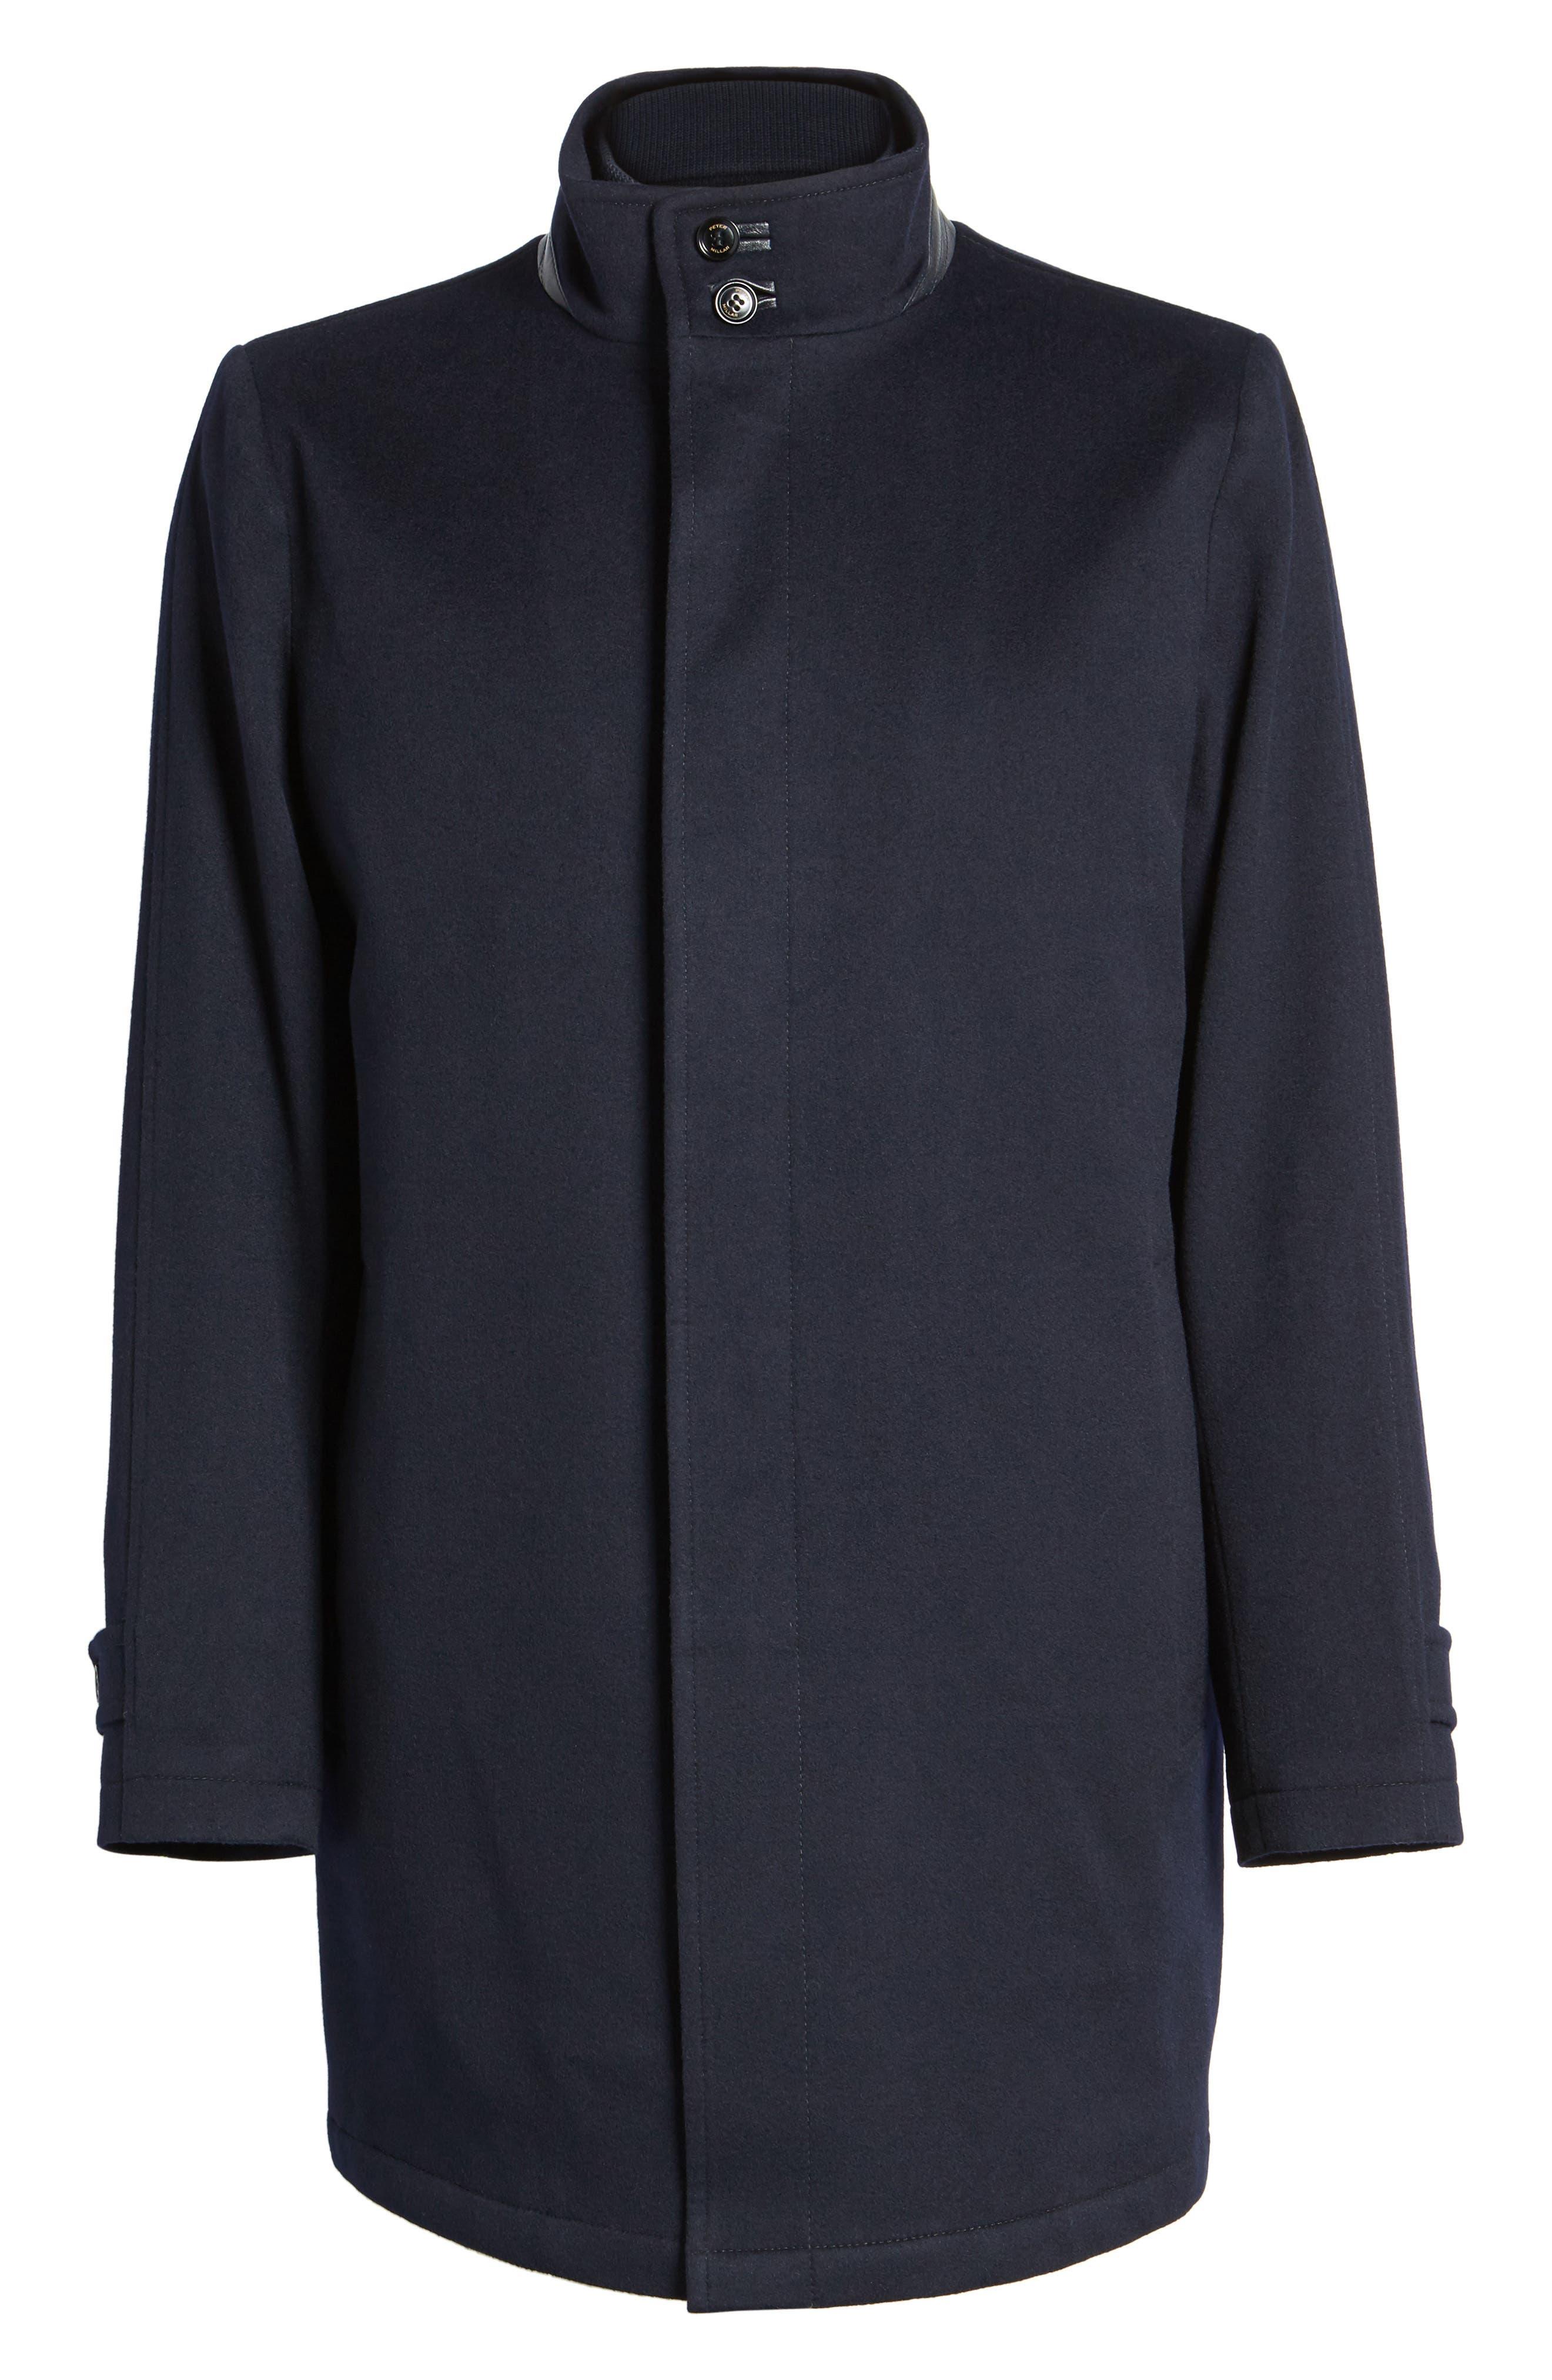 Peter Millar Horizon Wool Overcoat,                             Alternate thumbnail 5, color,                             001